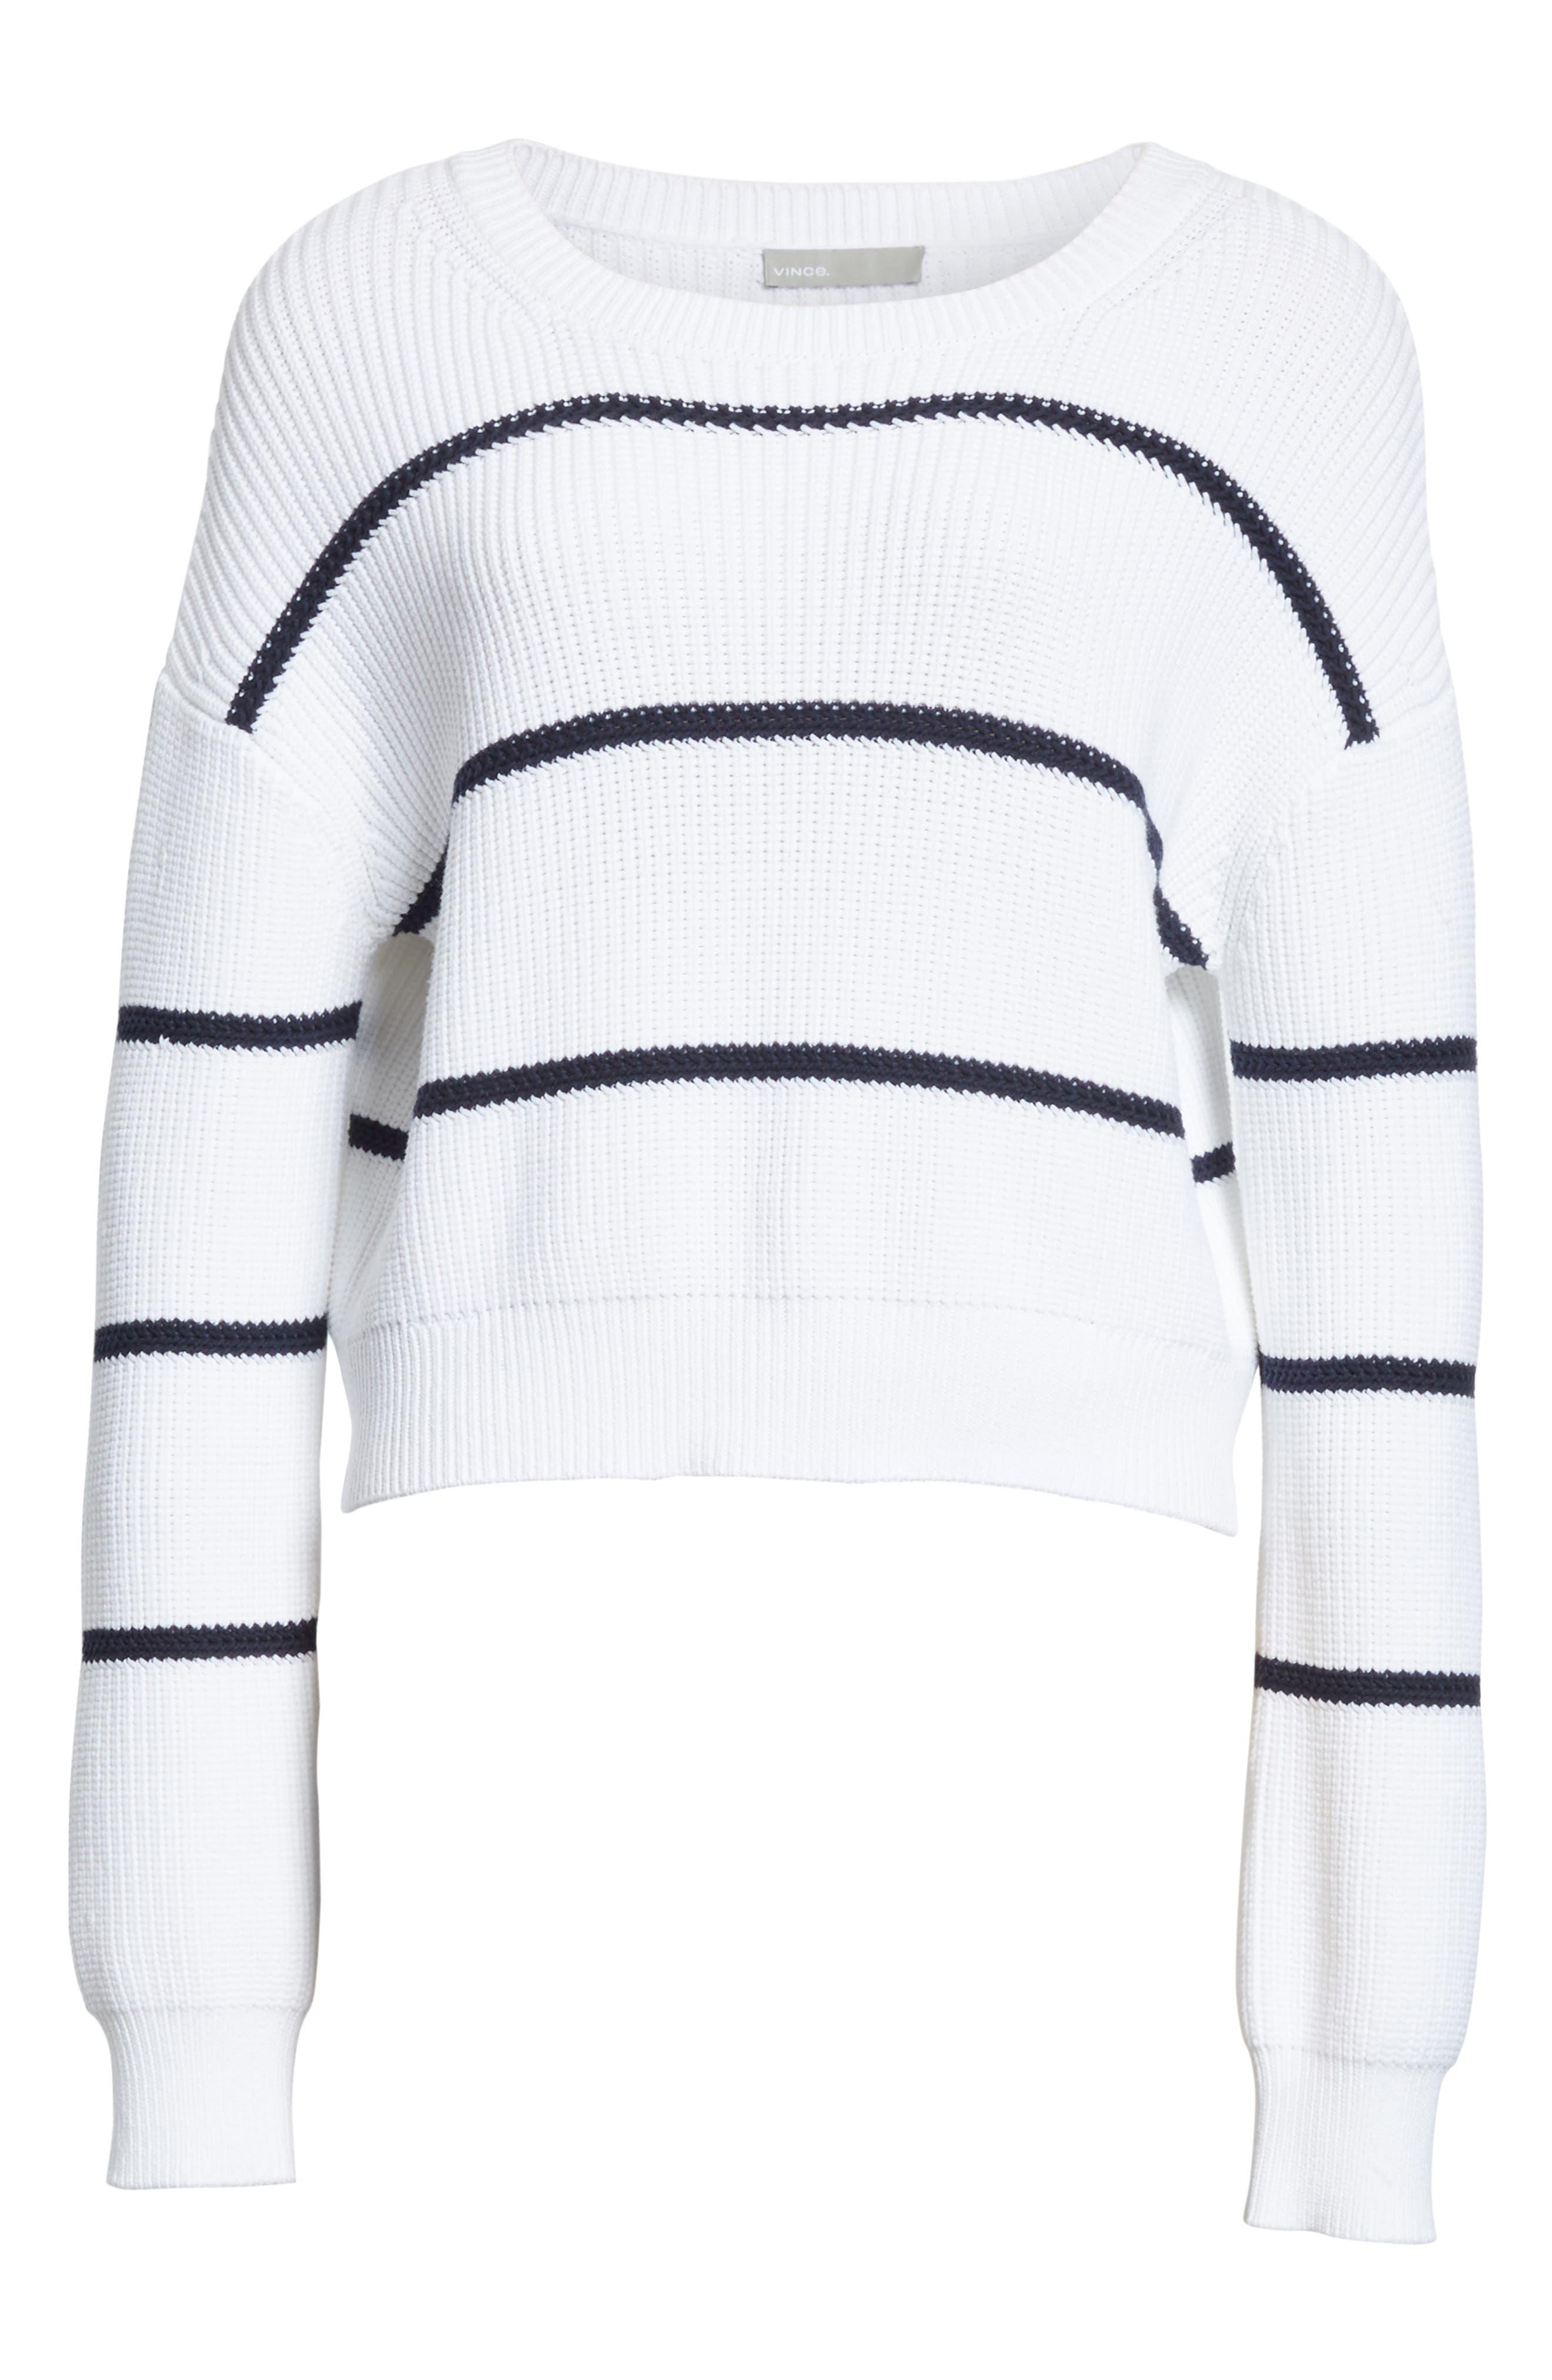 Cotton Blend Rib Knit Stripe Sweater,                             Alternate thumbnail 11, color,